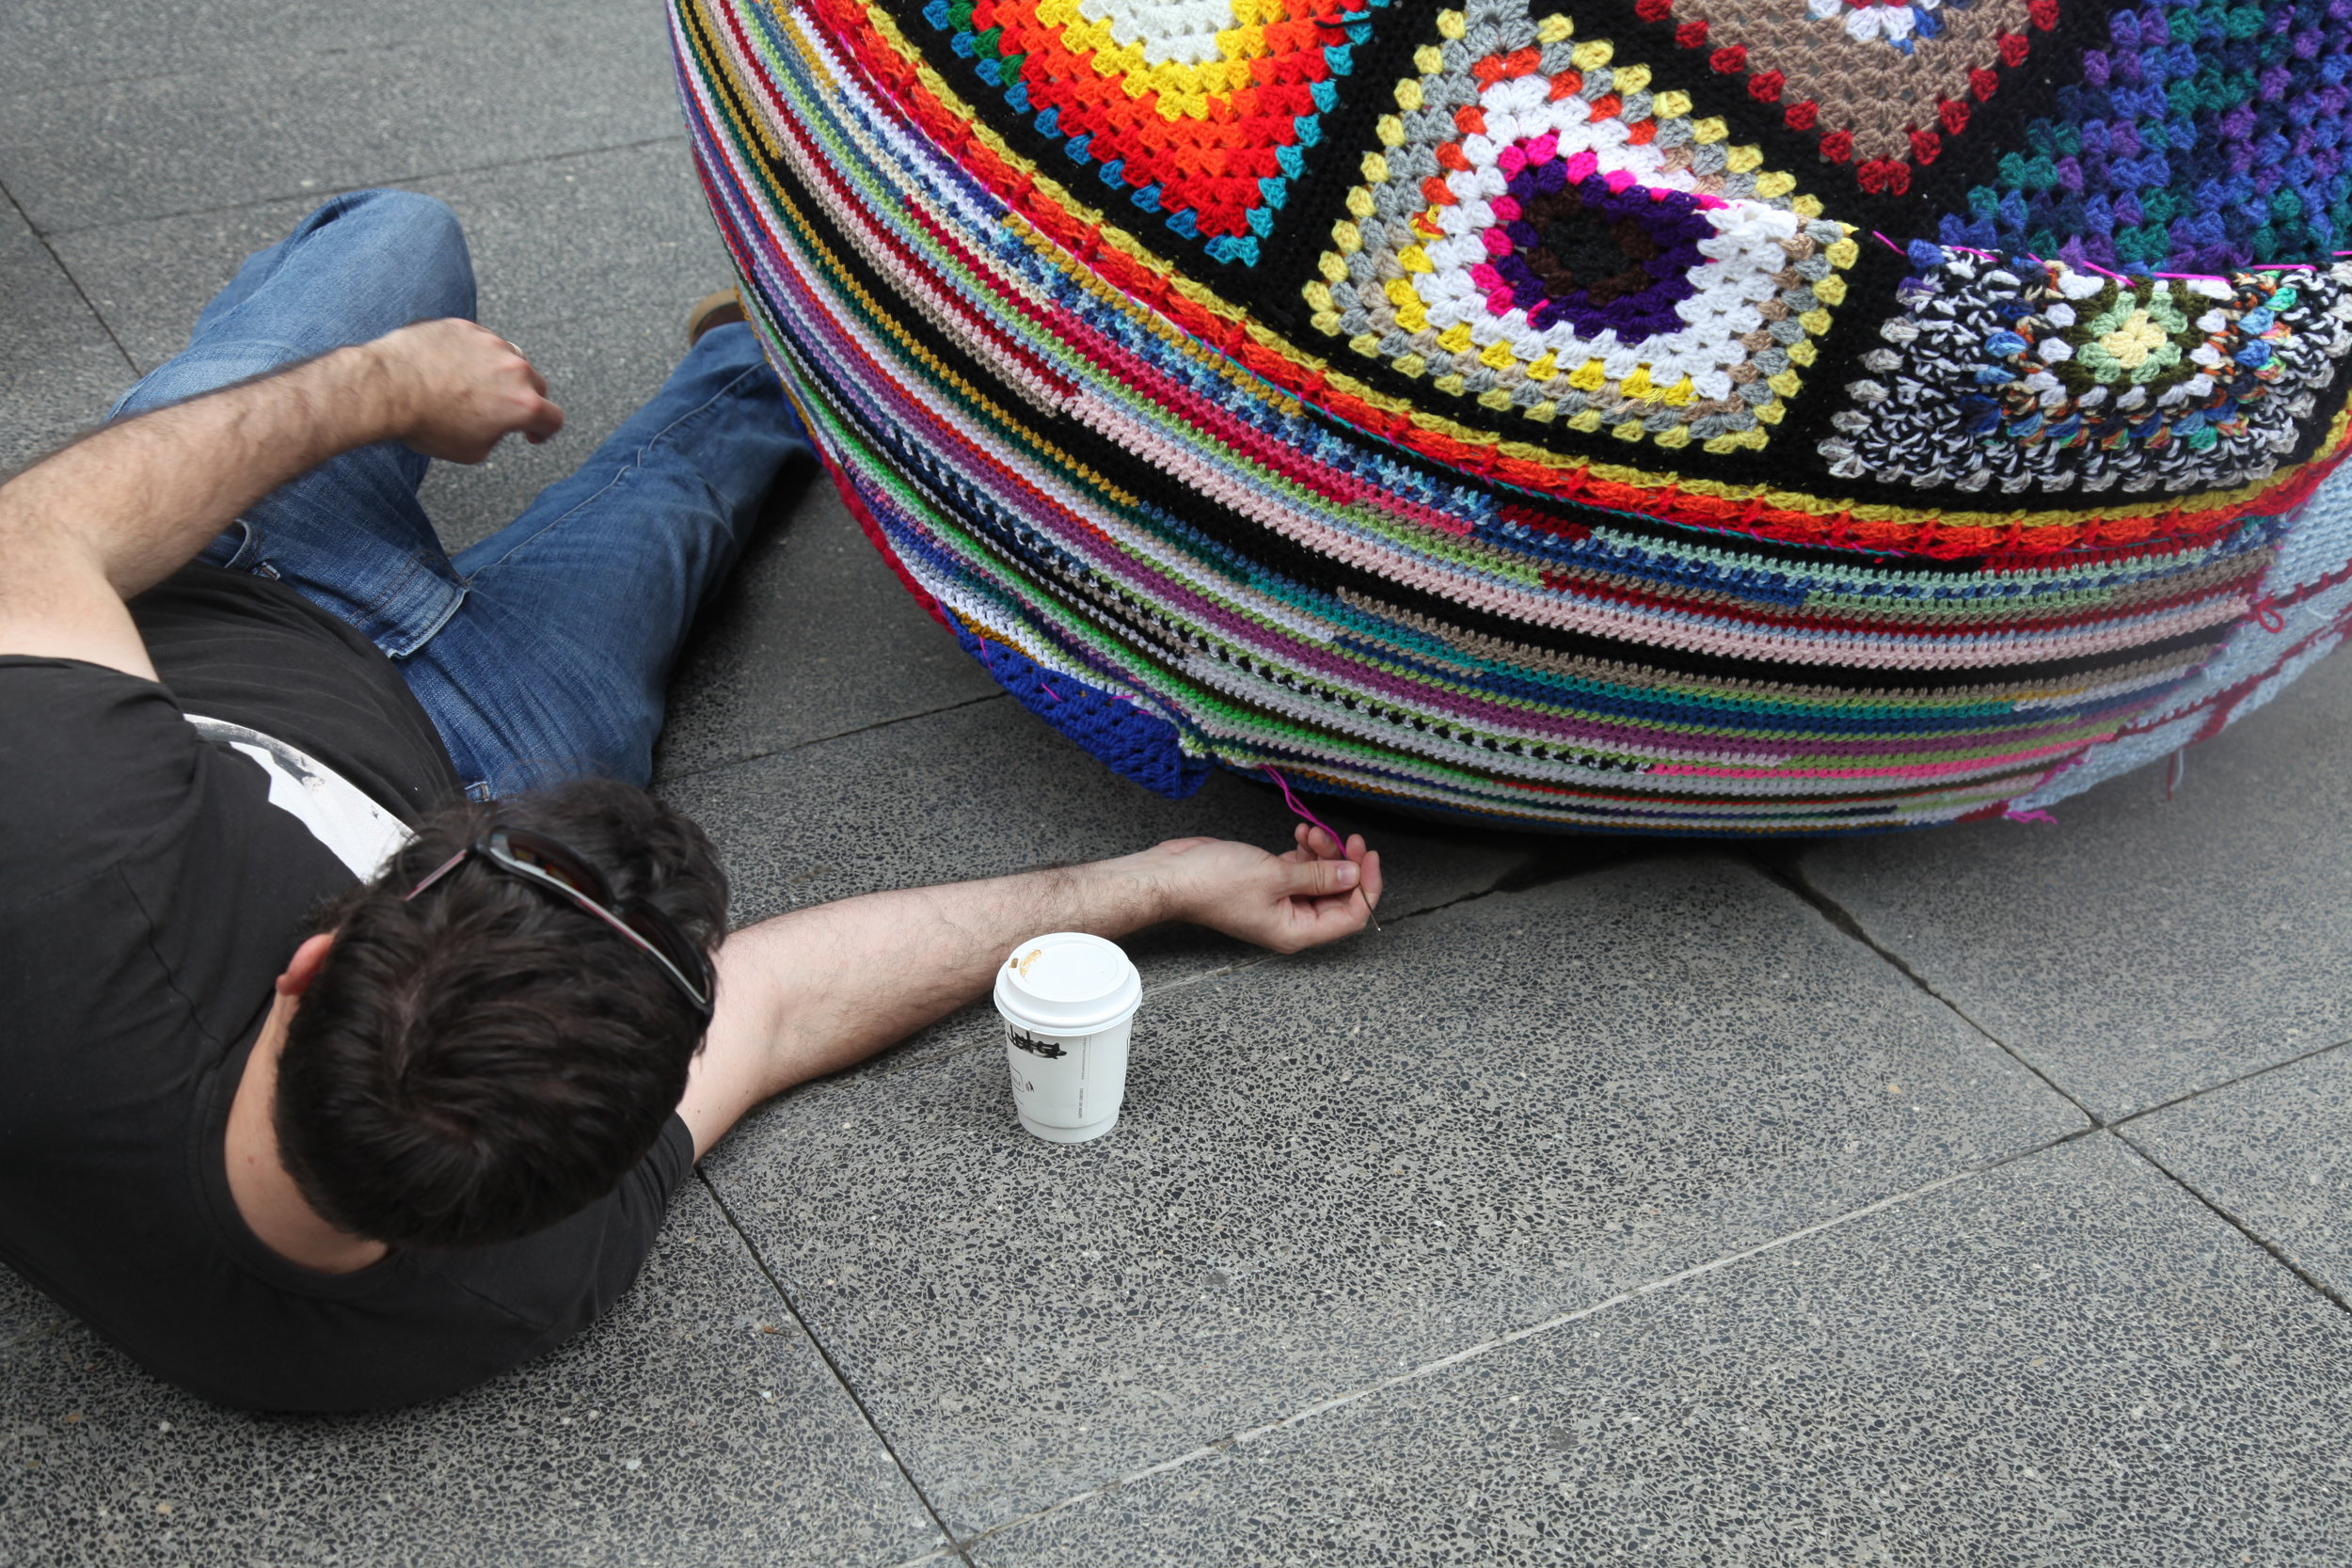 Creating a yarn bomb work of art 1705.JPG